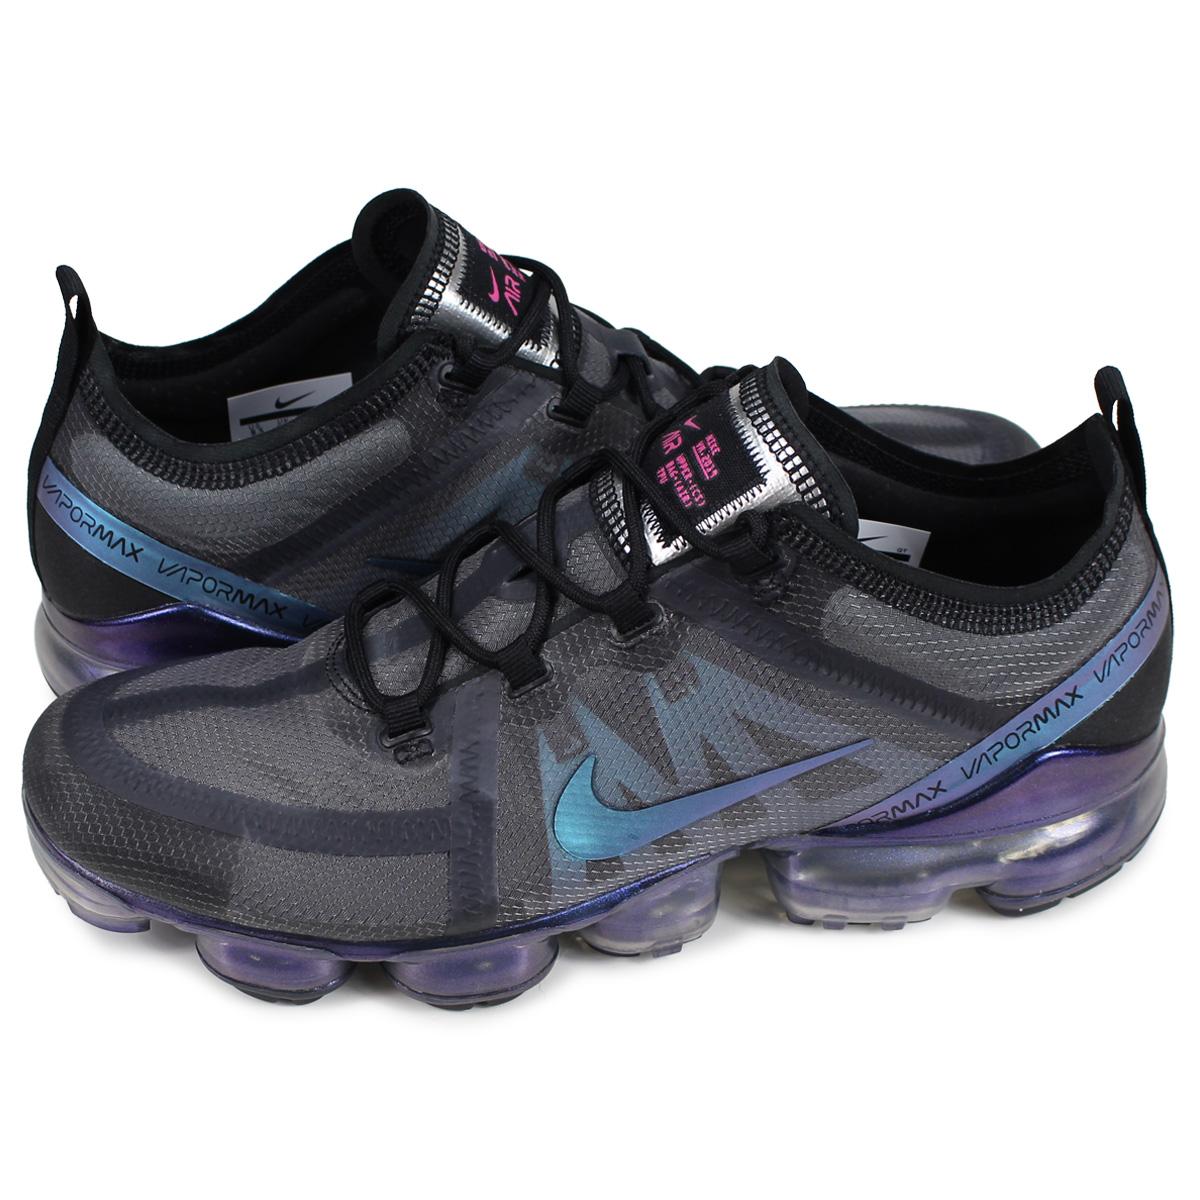 magasin en ligne eddef 98393 Nike NIKE air vapor max 2019 sneakers men AIR VAPORMAX 2019 black black  AR6631-001 [194]